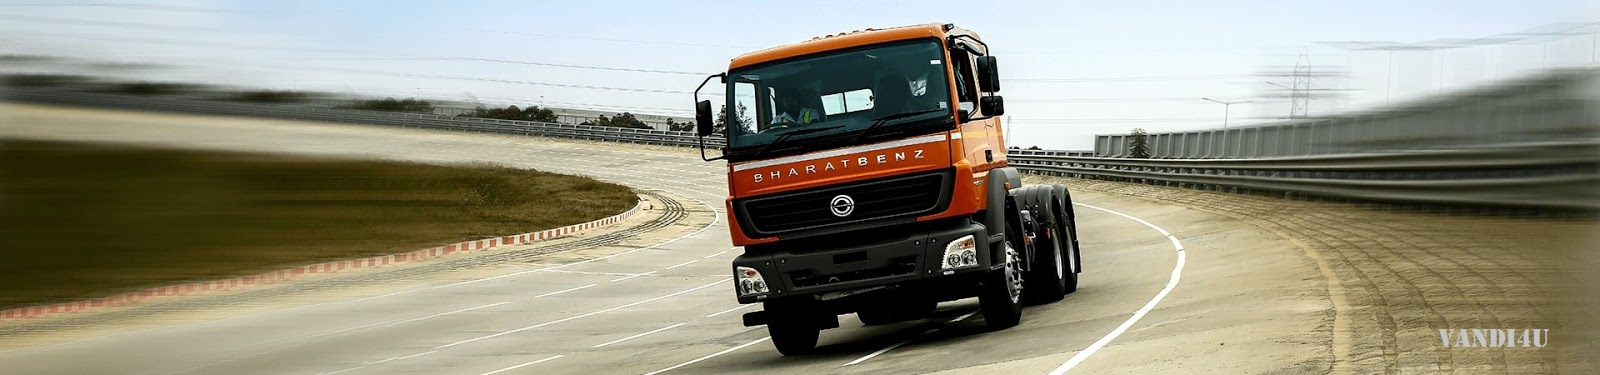 Daimler India Commercial Vehicles Crosses 25,000 Export Milestone | VANDI4U